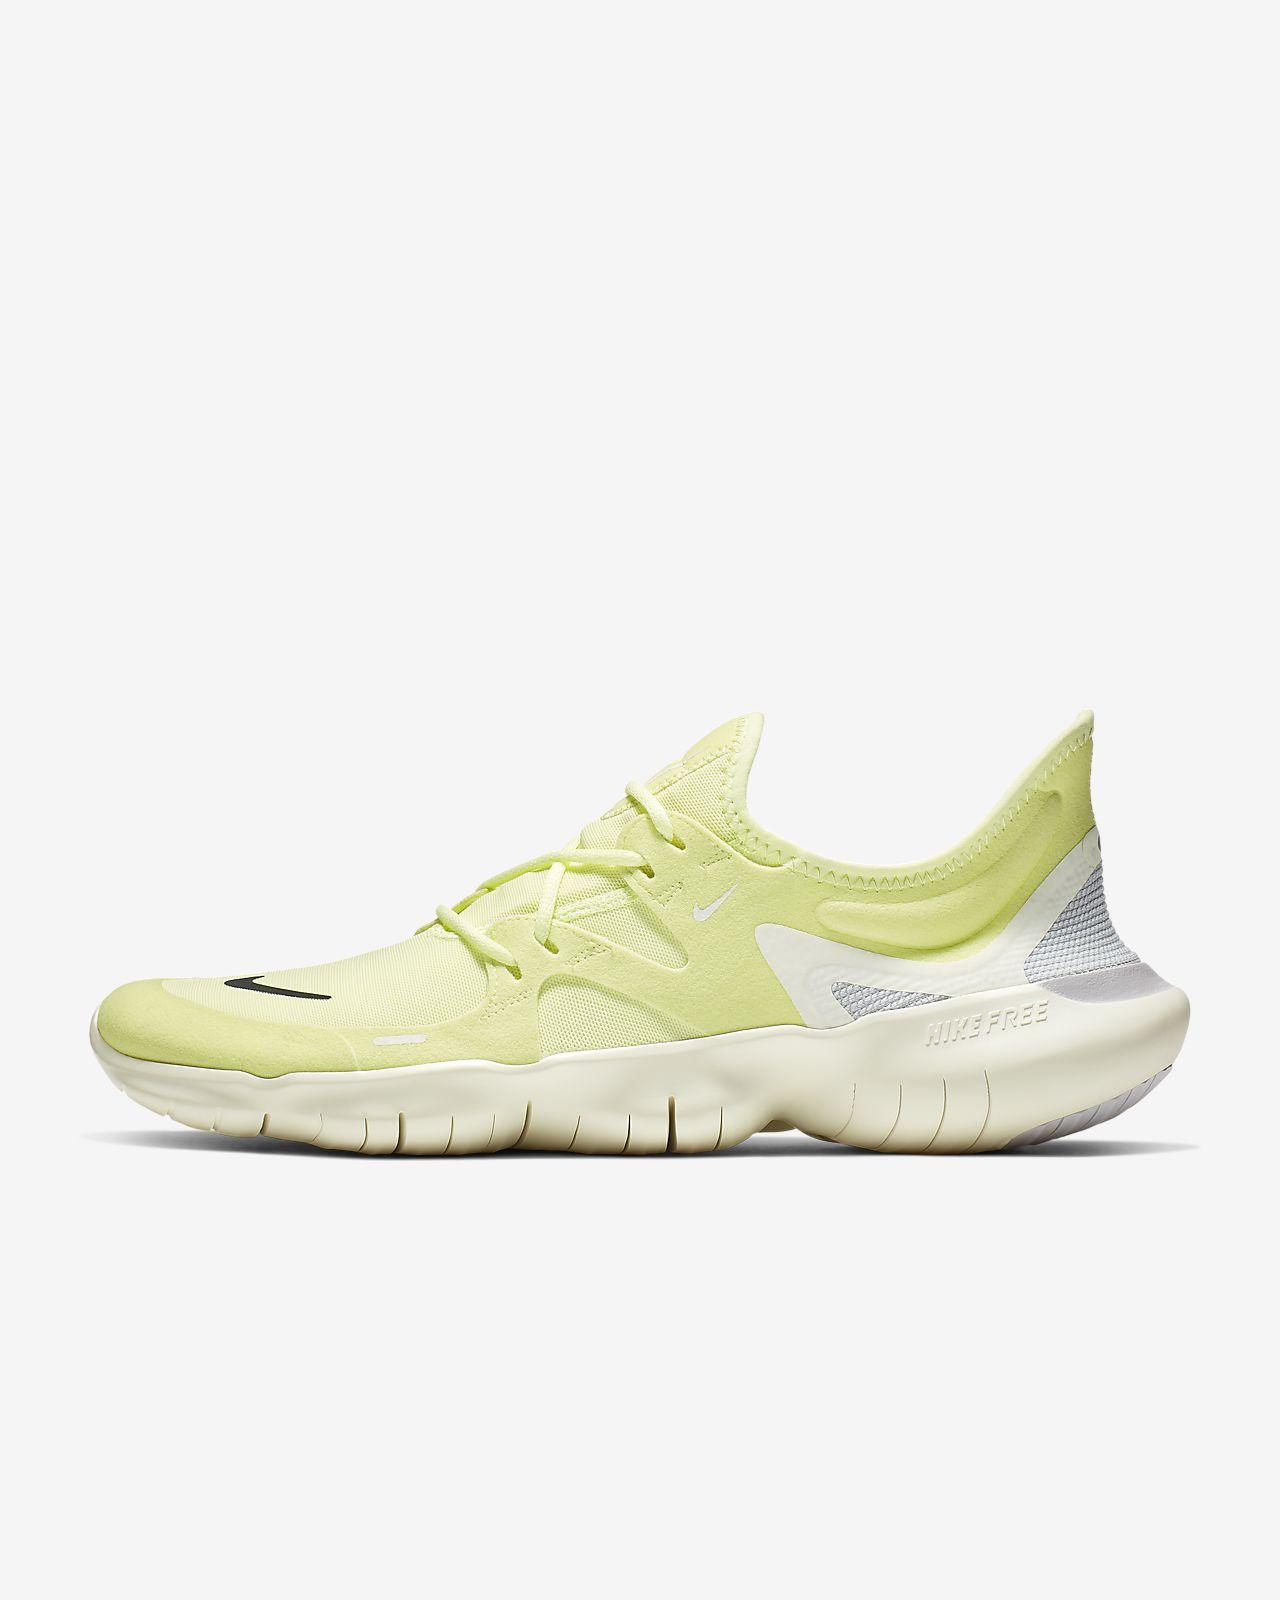 the best attitude ce659 04302 Nike Free RN 5.0 Men's Running Shoe